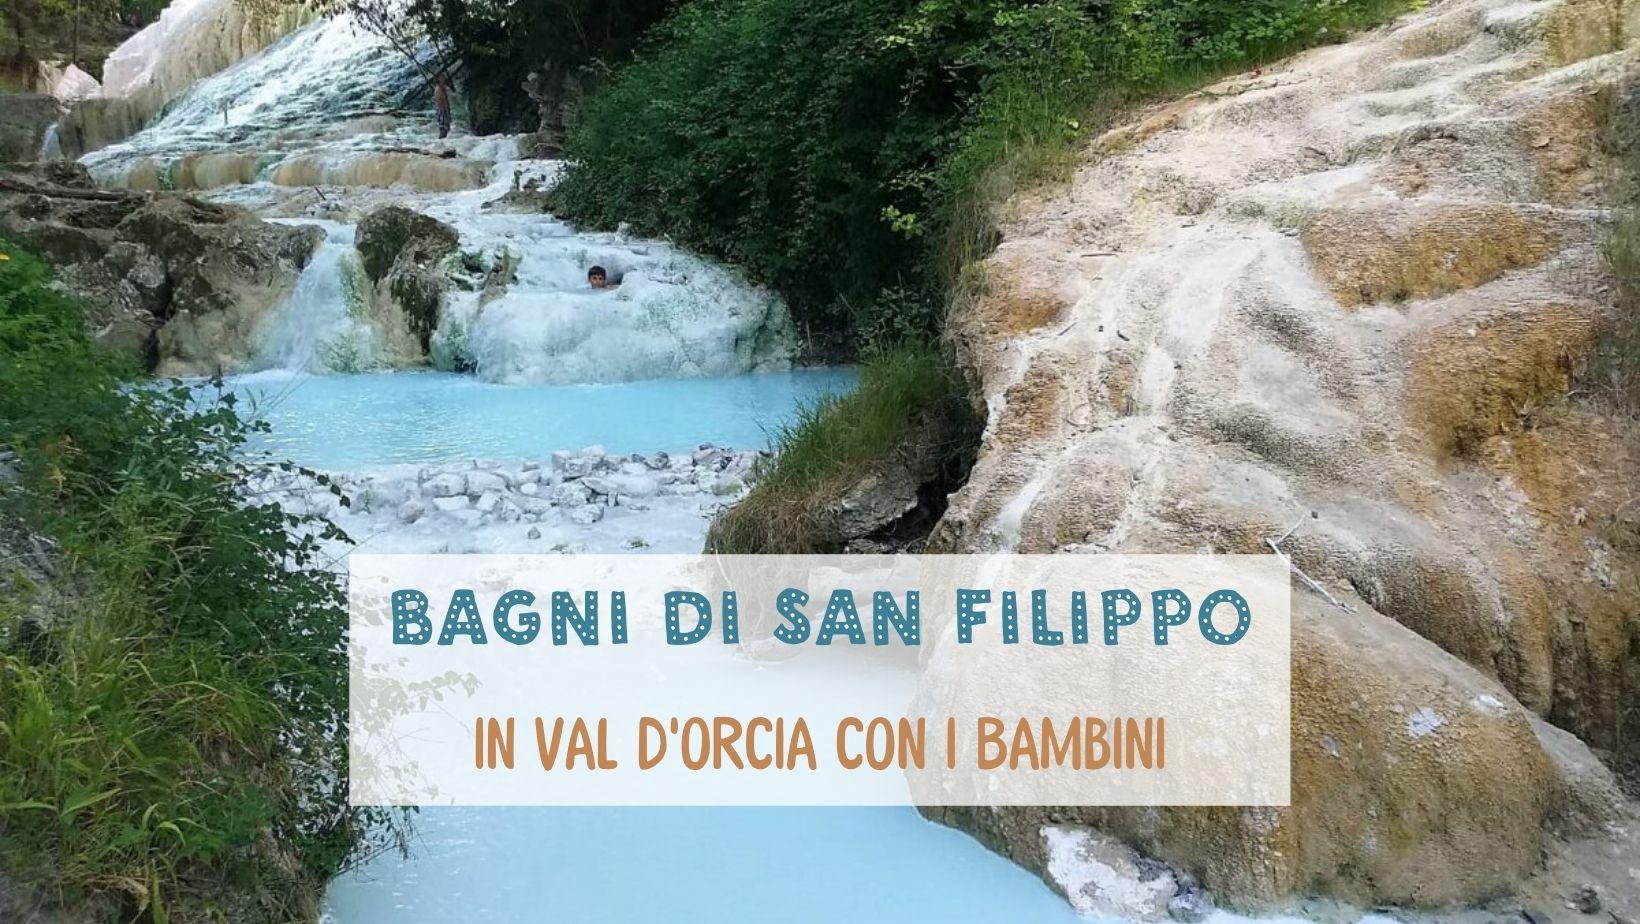 You are currently viewing Bagni di San Filippo: cercando la Balena Bianca in Val d'Orcia